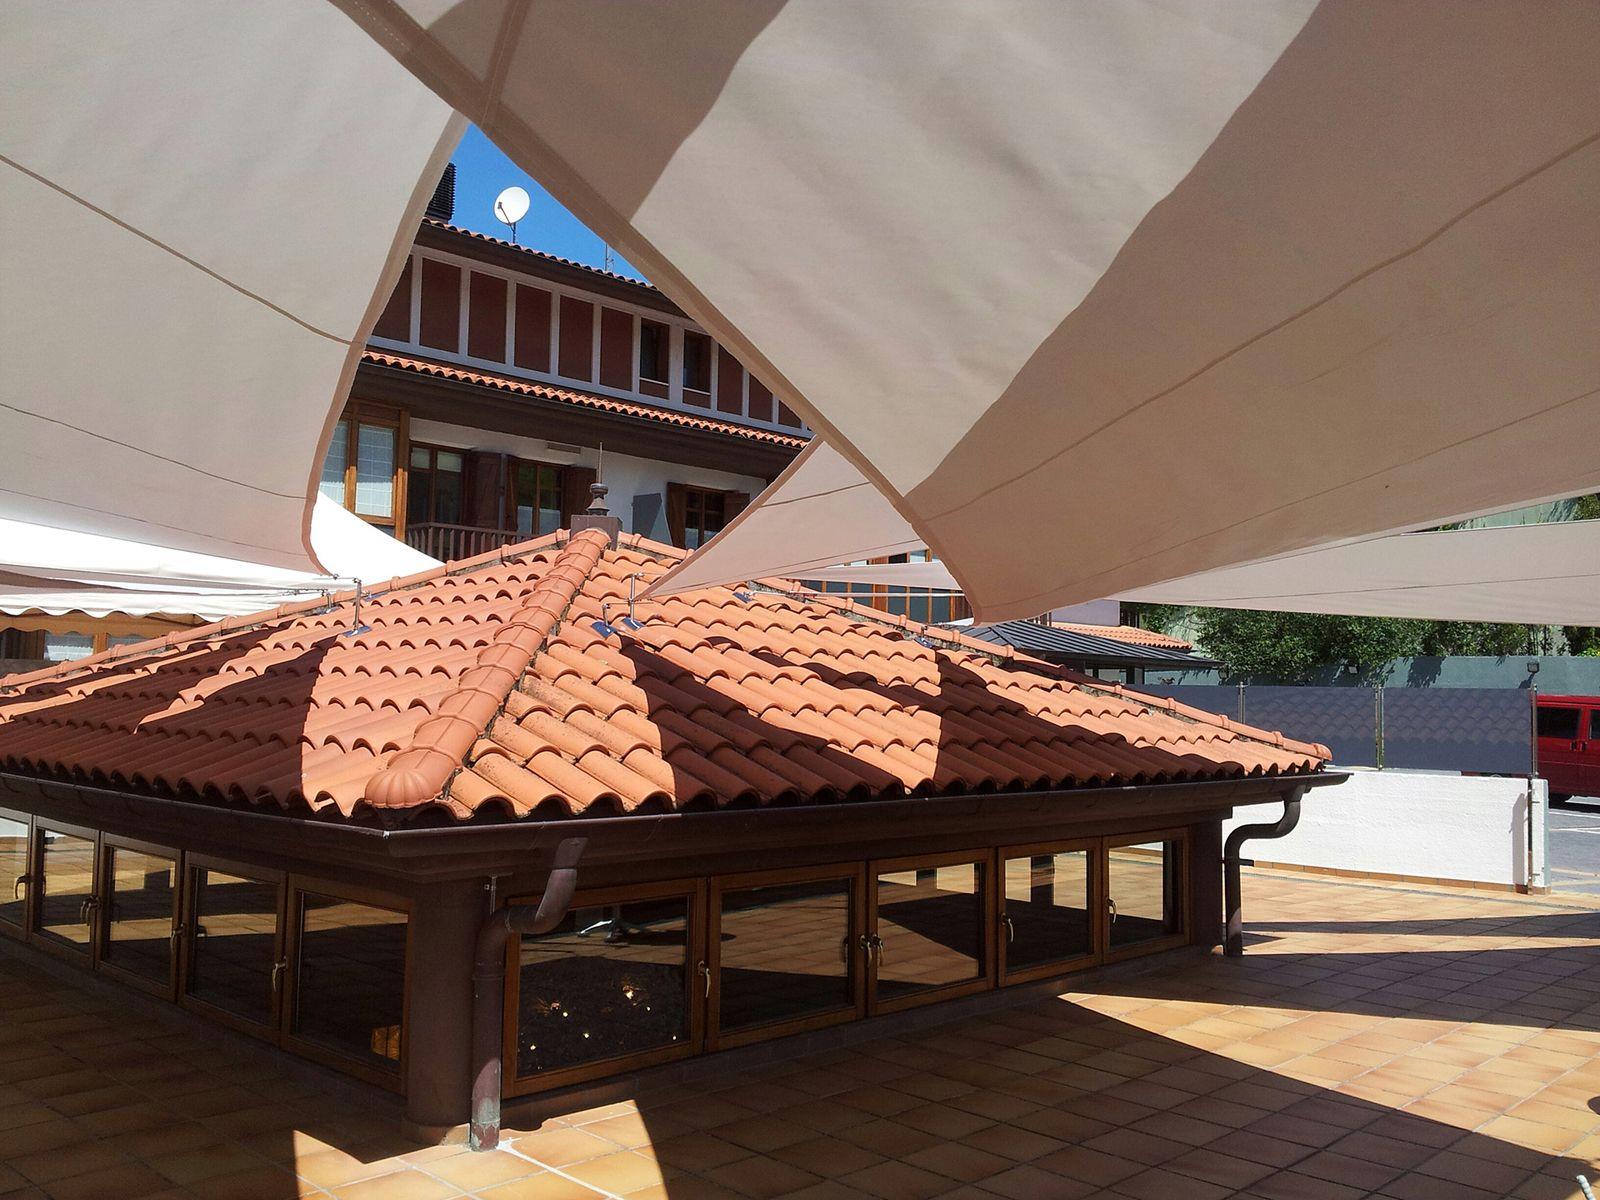 Fábrica de toldos en Donosti